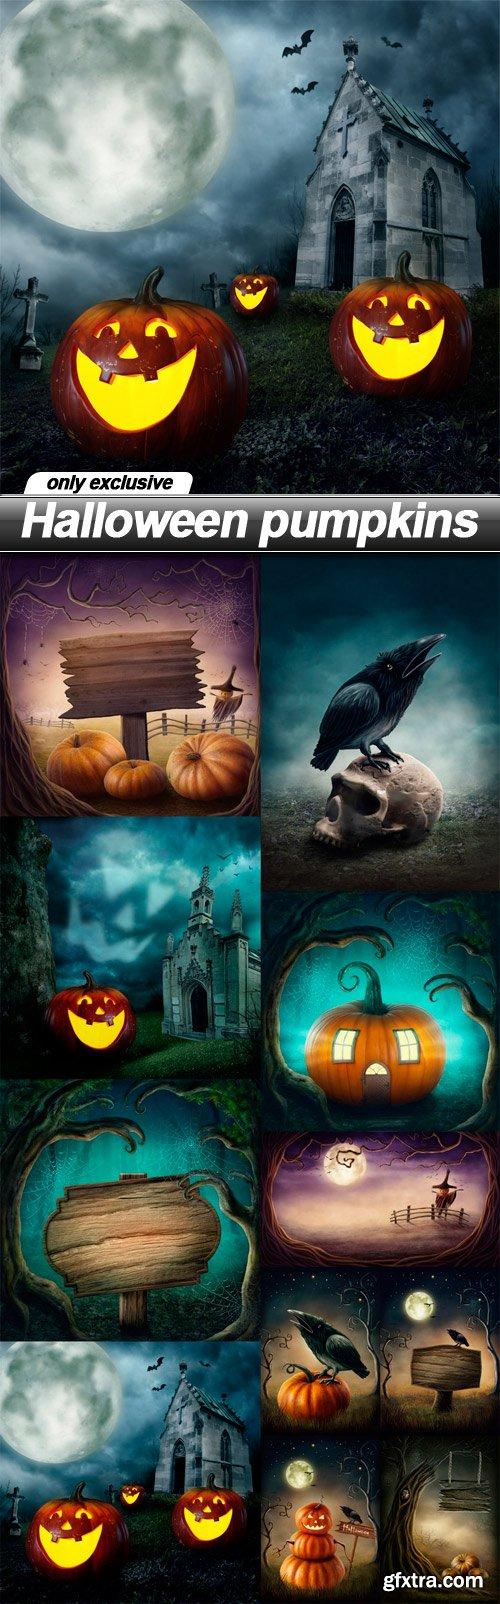 Halloween pumpkins - 11 UHQ JPEG